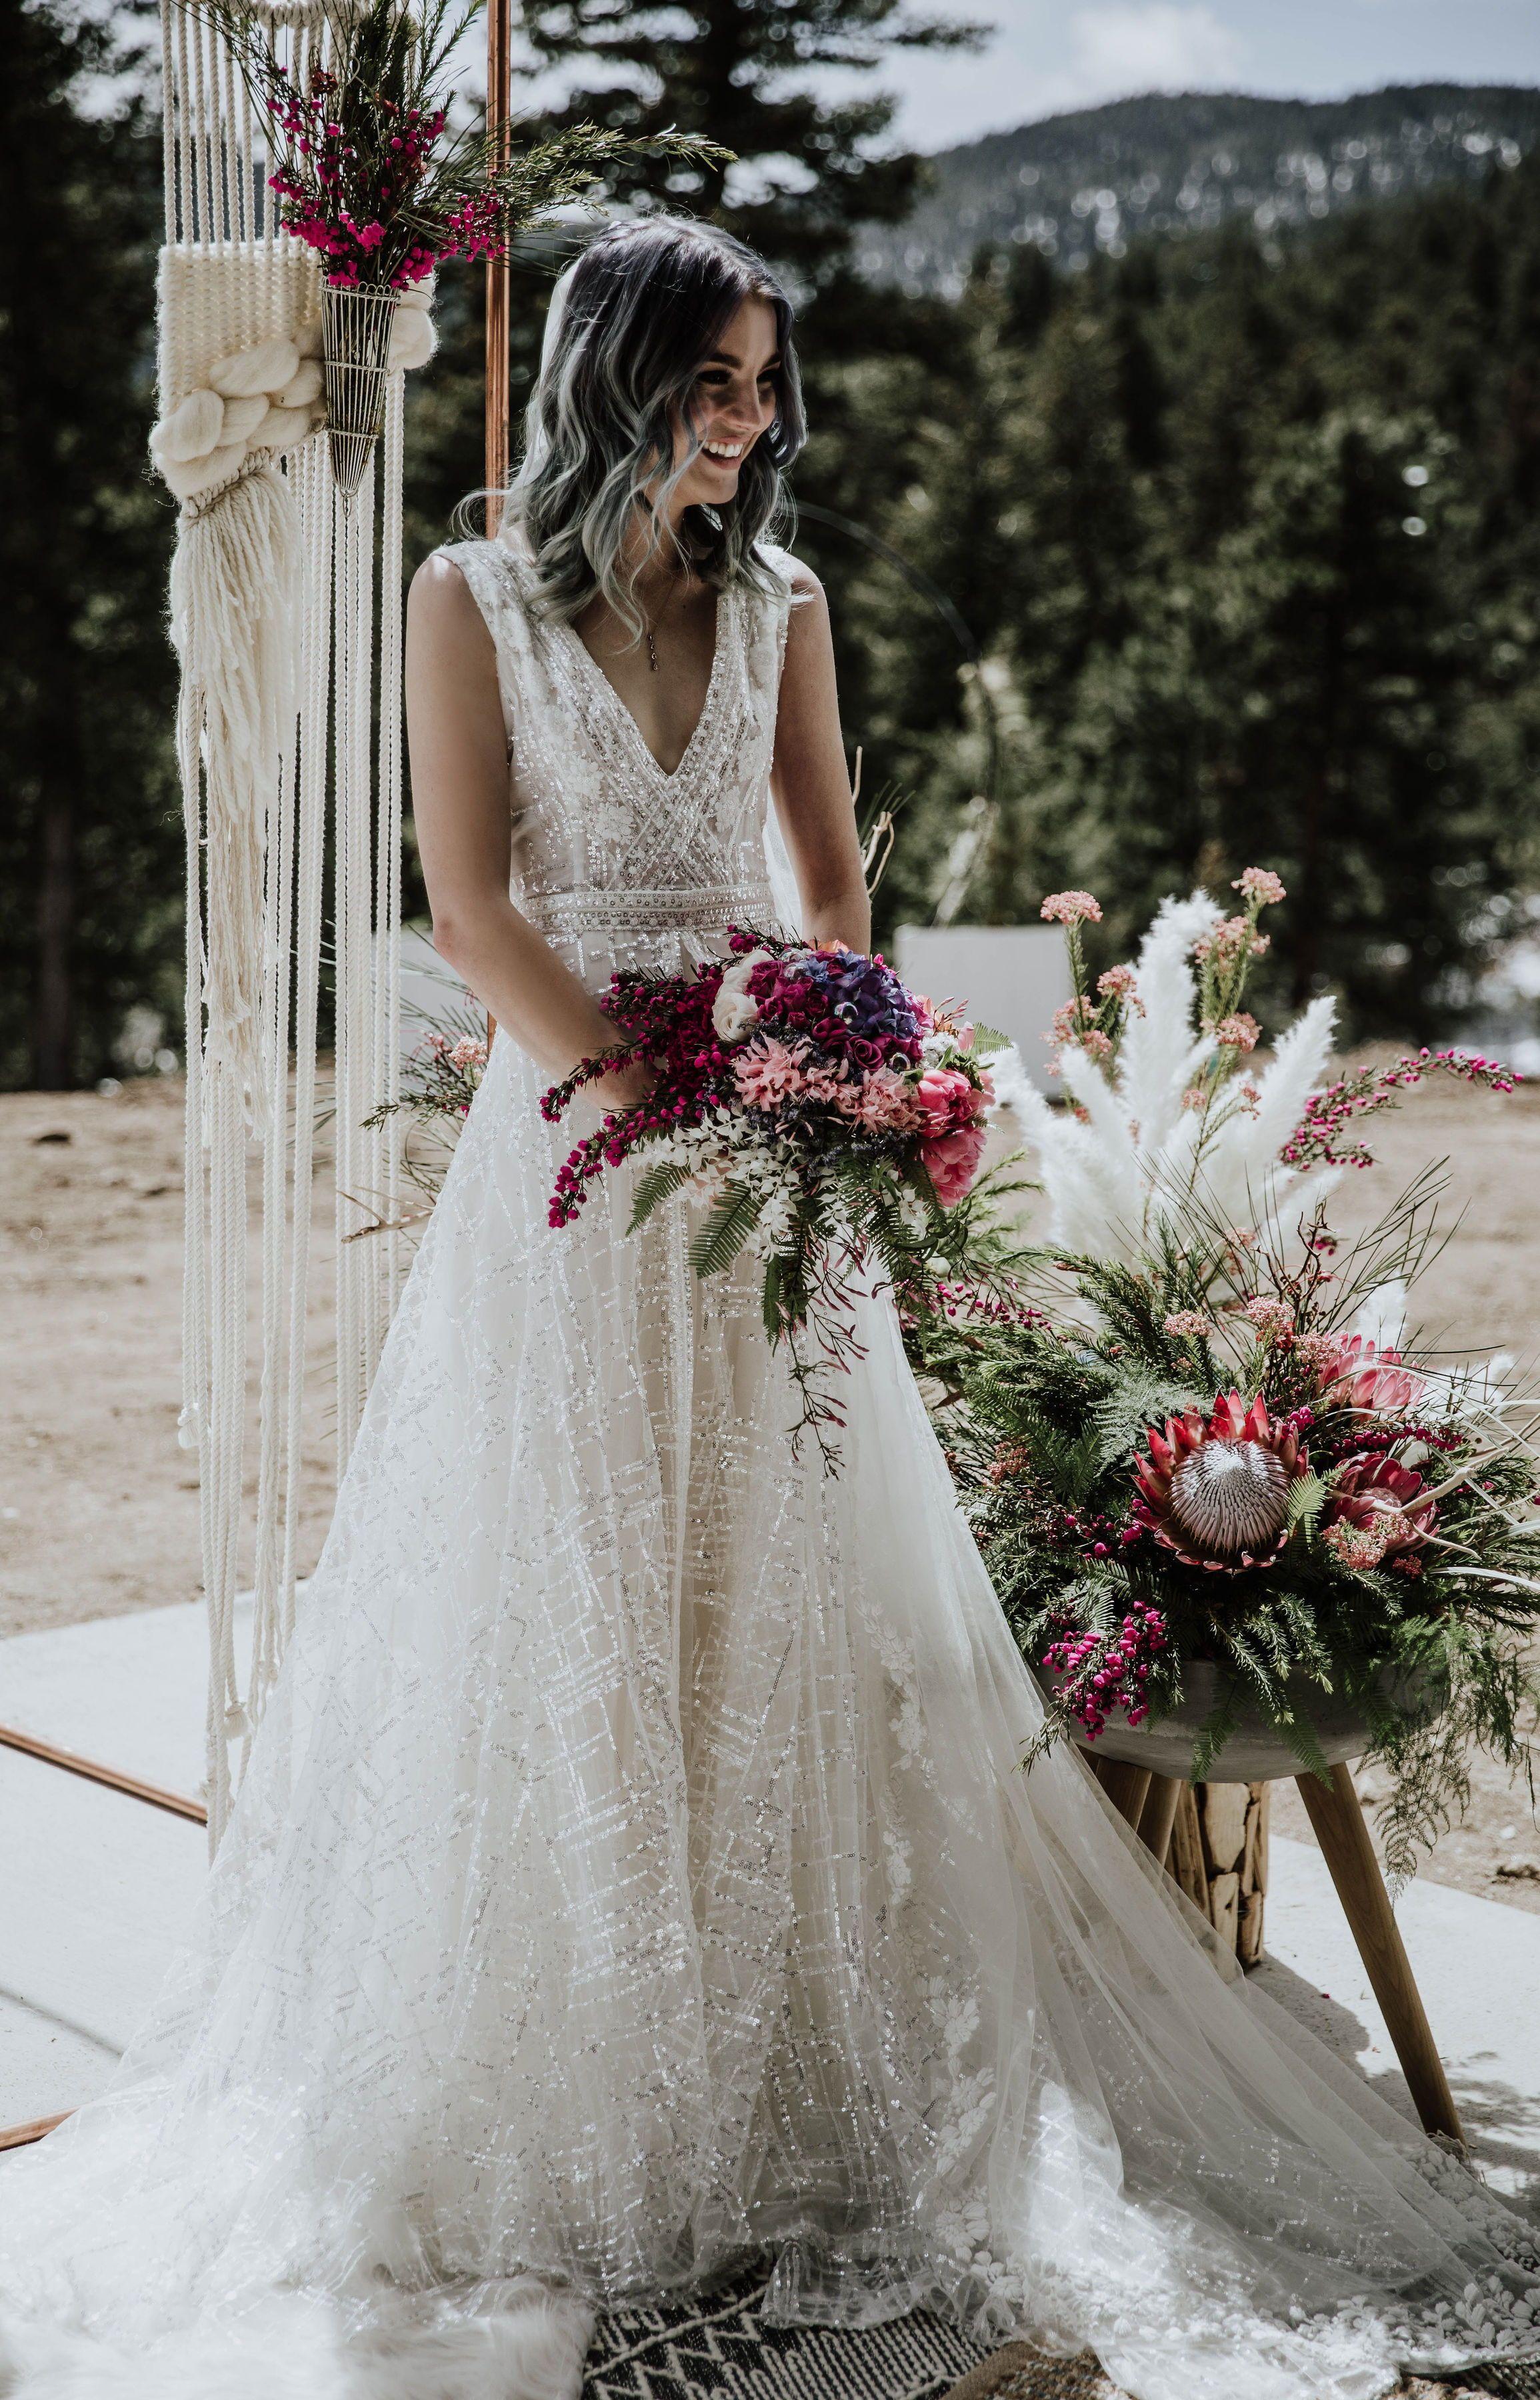 Bubbly Colorful Mountain Bridal Rish Bridal Modern Sparkly Boho Wedding Dress Wedding Dress Cap Sleeves Wedding Dresses Whimsical Mountain Wedding Dress